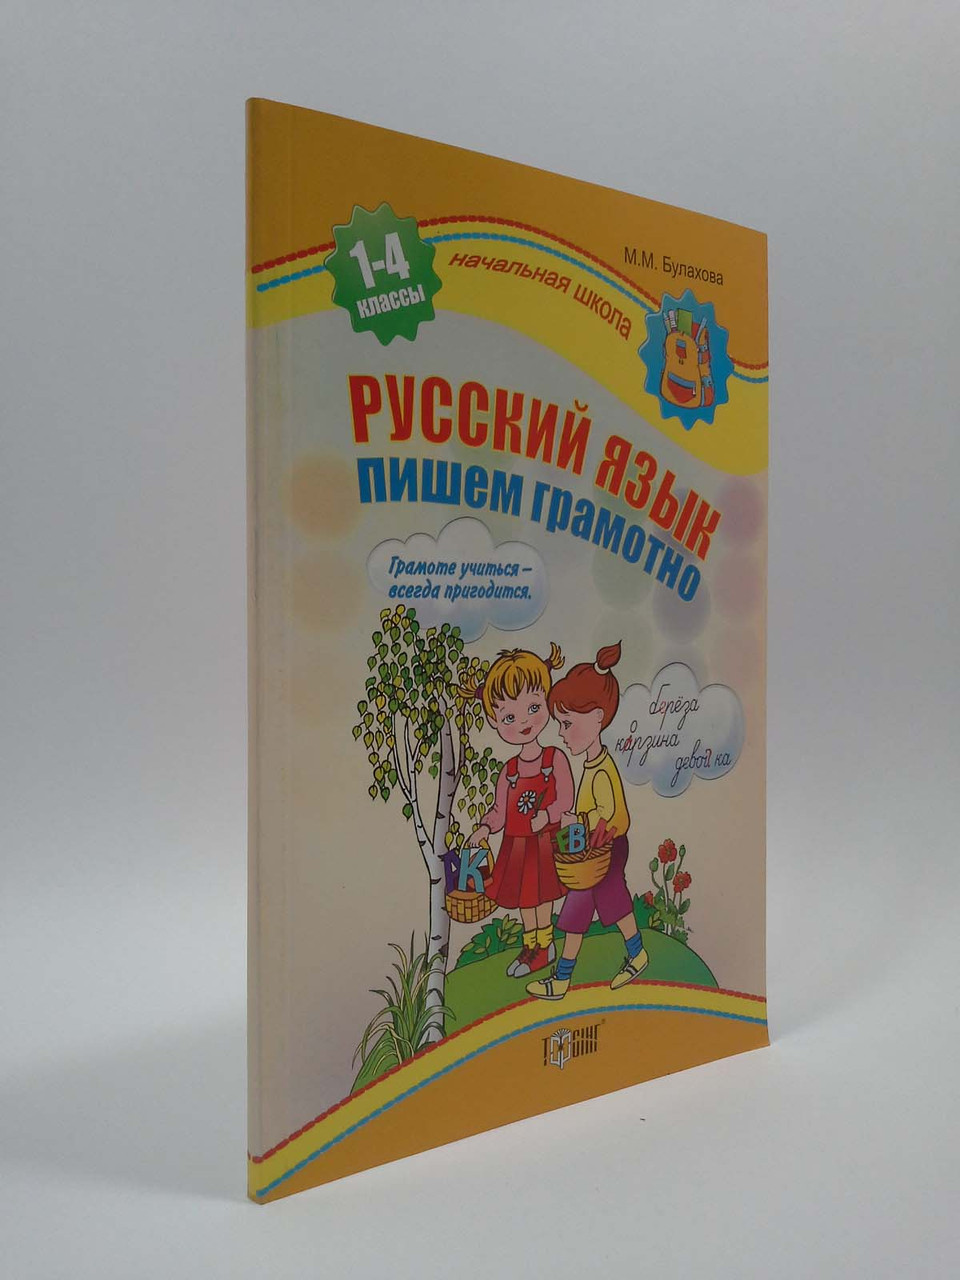 Торсінг Початкова школа Рус язык 001-04 кл Пишем грамотно Булахова